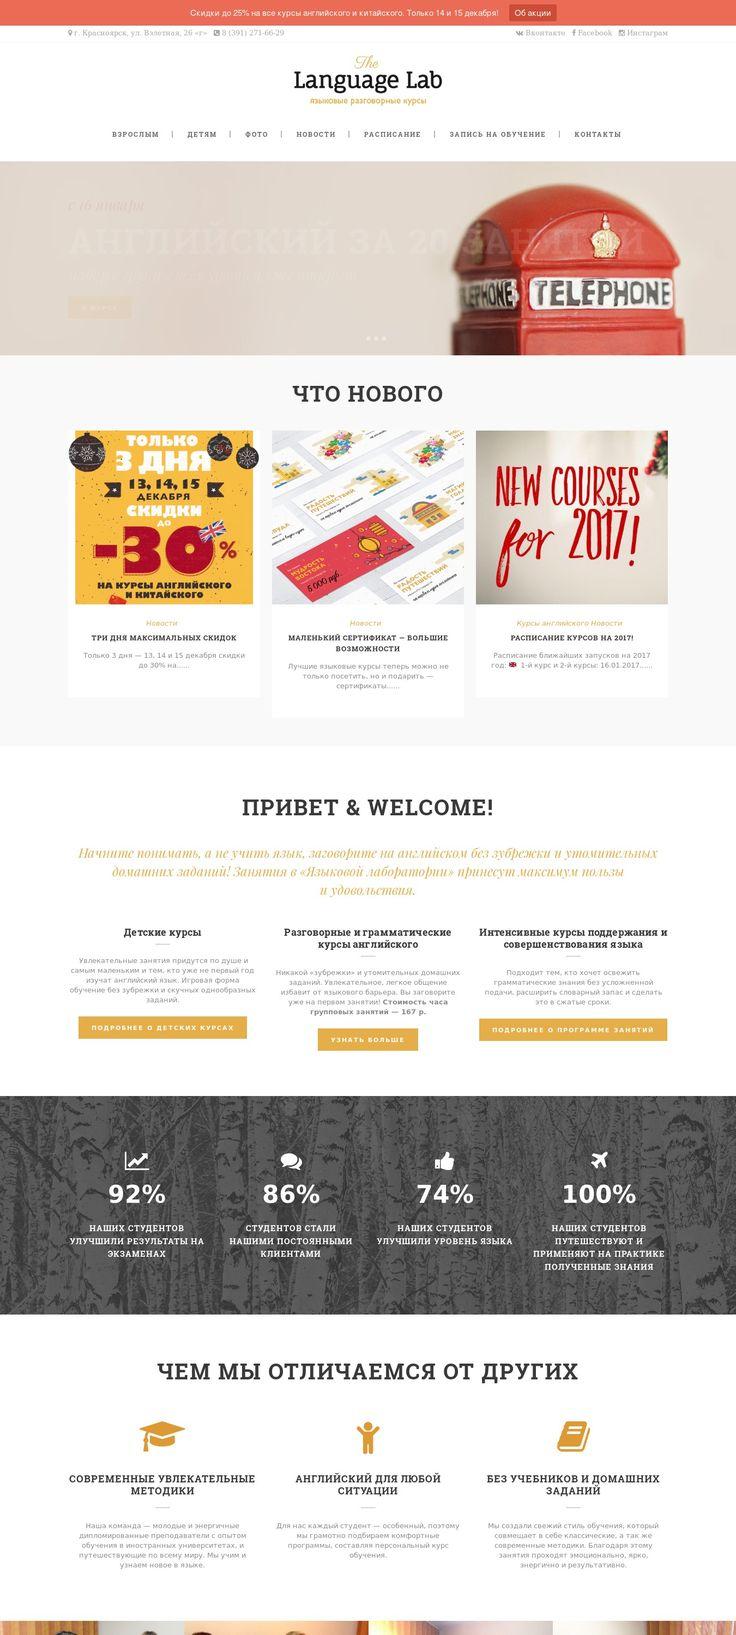 Best 25+ Wordpress template ideas on Pinterest | Php website, Php ...